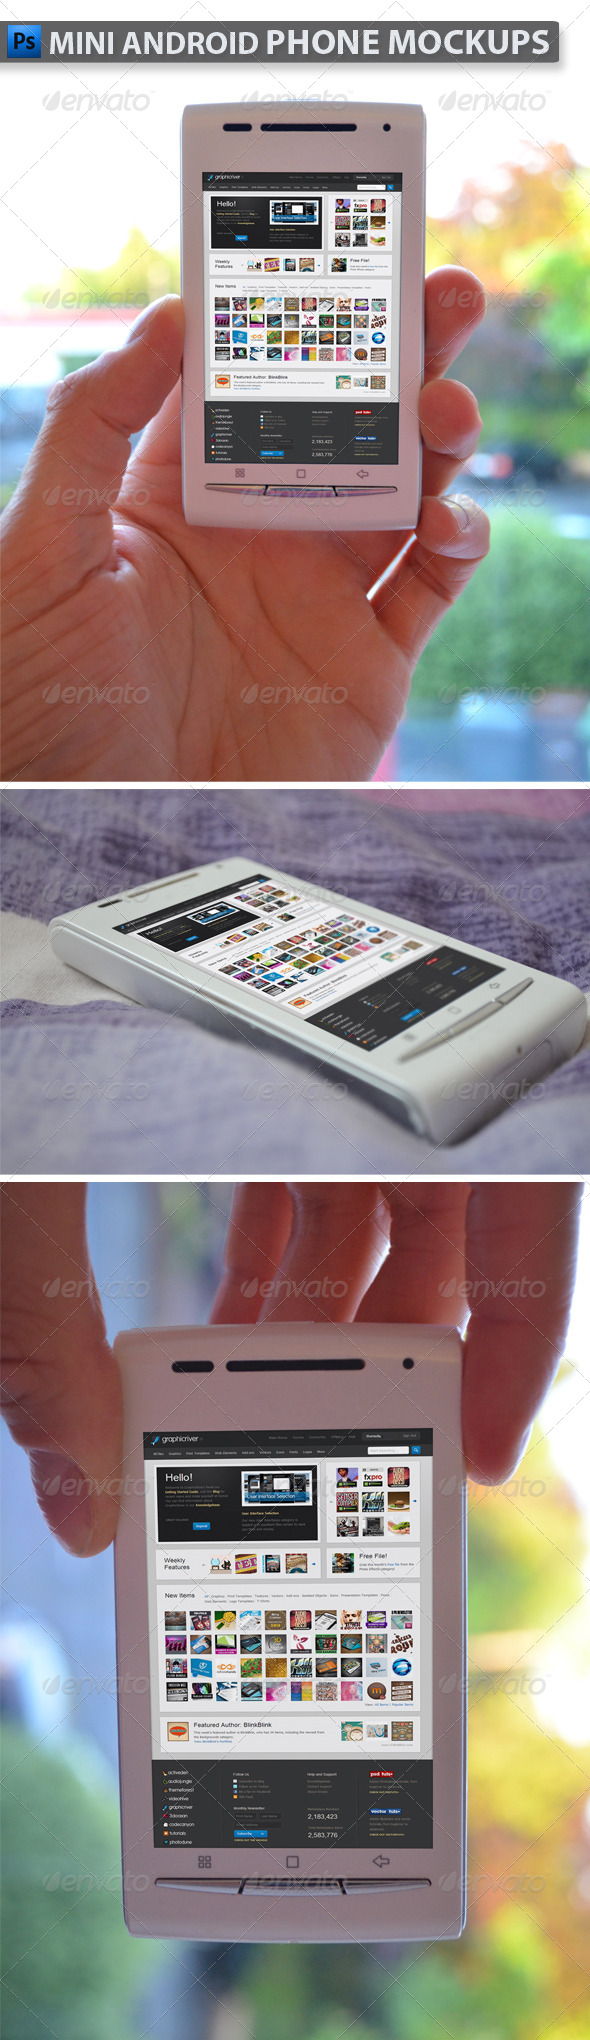 Mini Phone Mockups - Product Mock-Ups Graphics